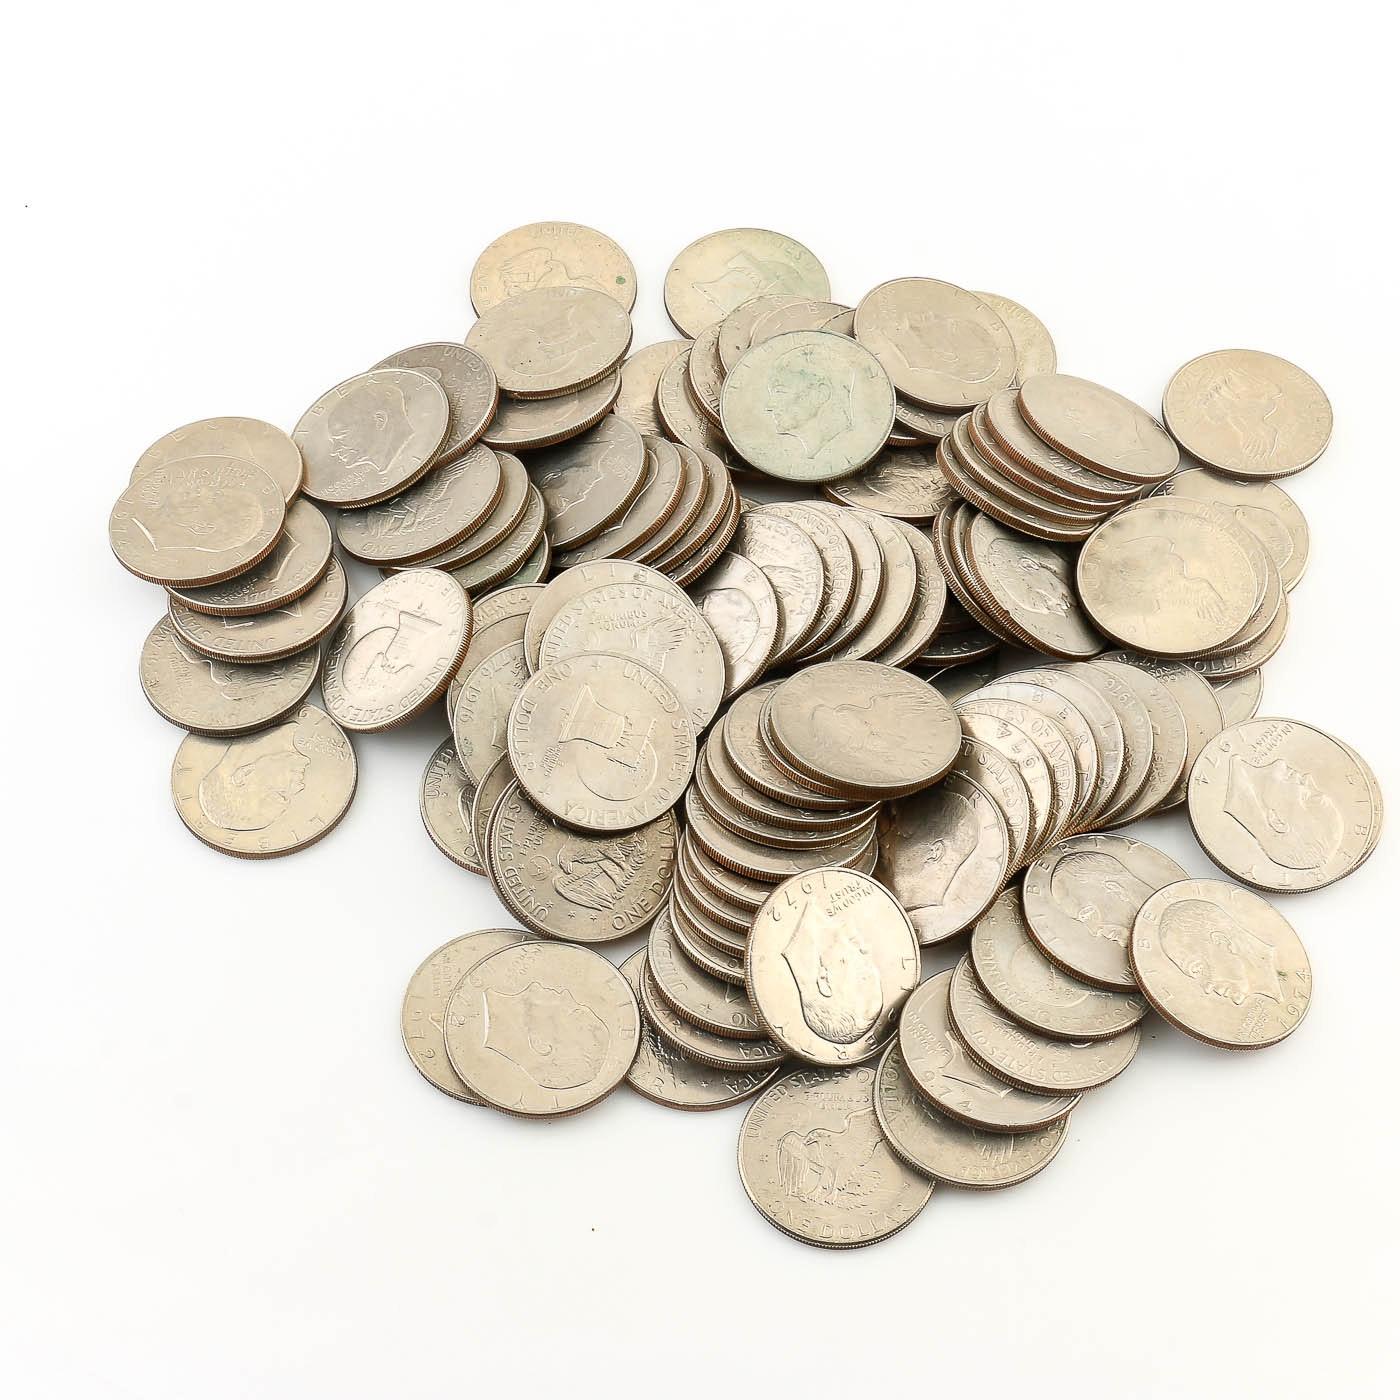 113 Eisenhower Dollar Coins 1971-1977